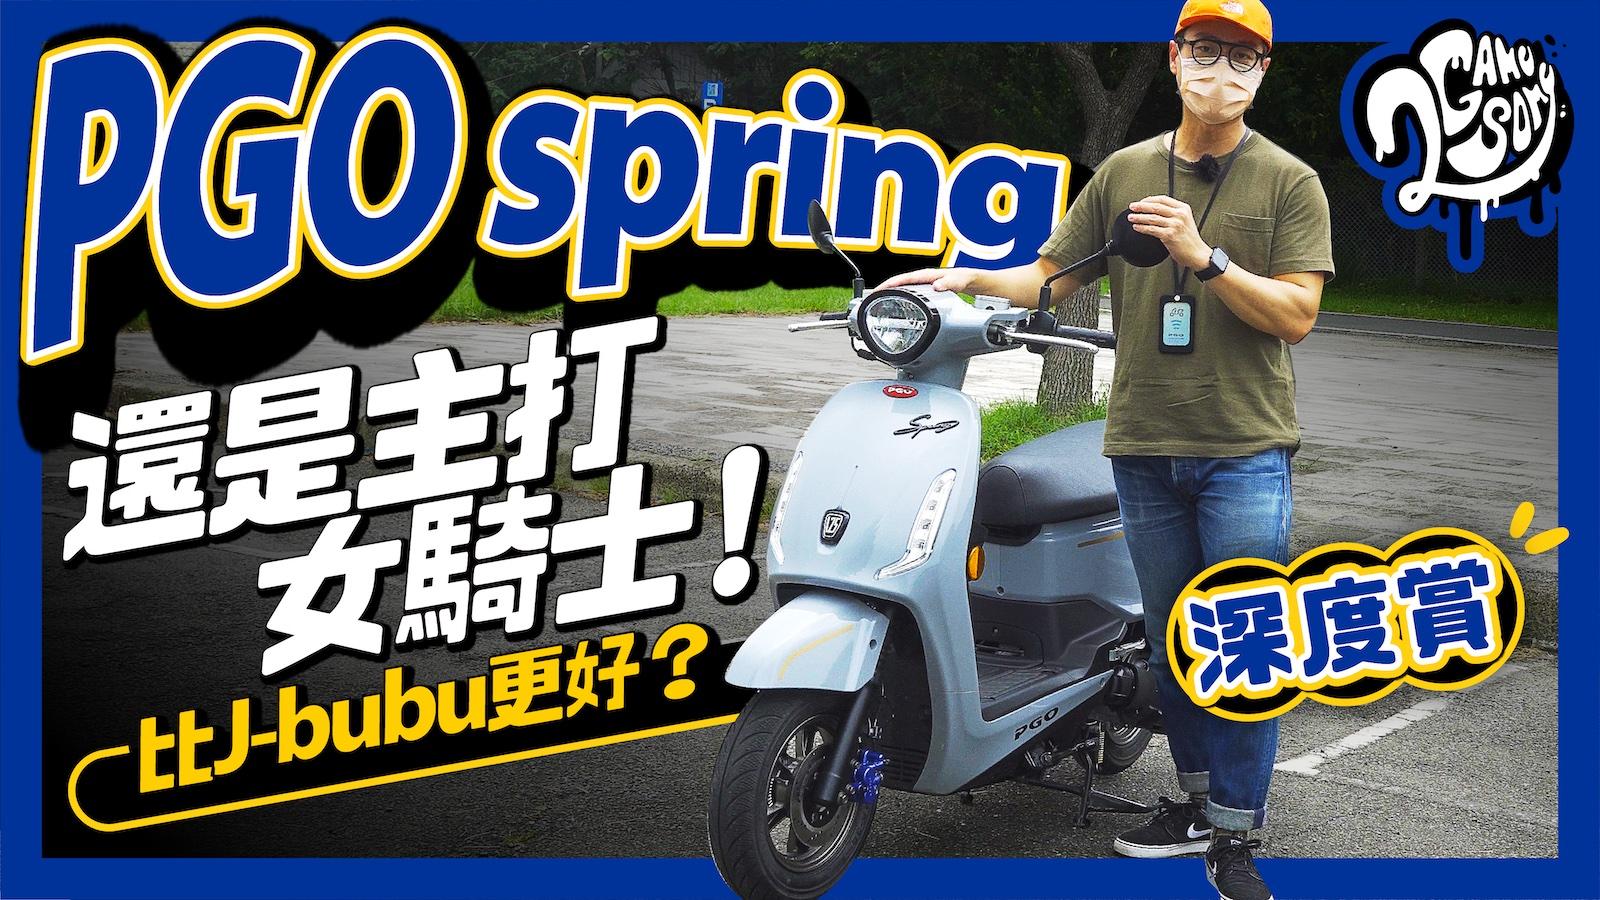 PGO Spring 深度賞|還是主打女騎士!跟 J-bubu 比起來更好嗎?